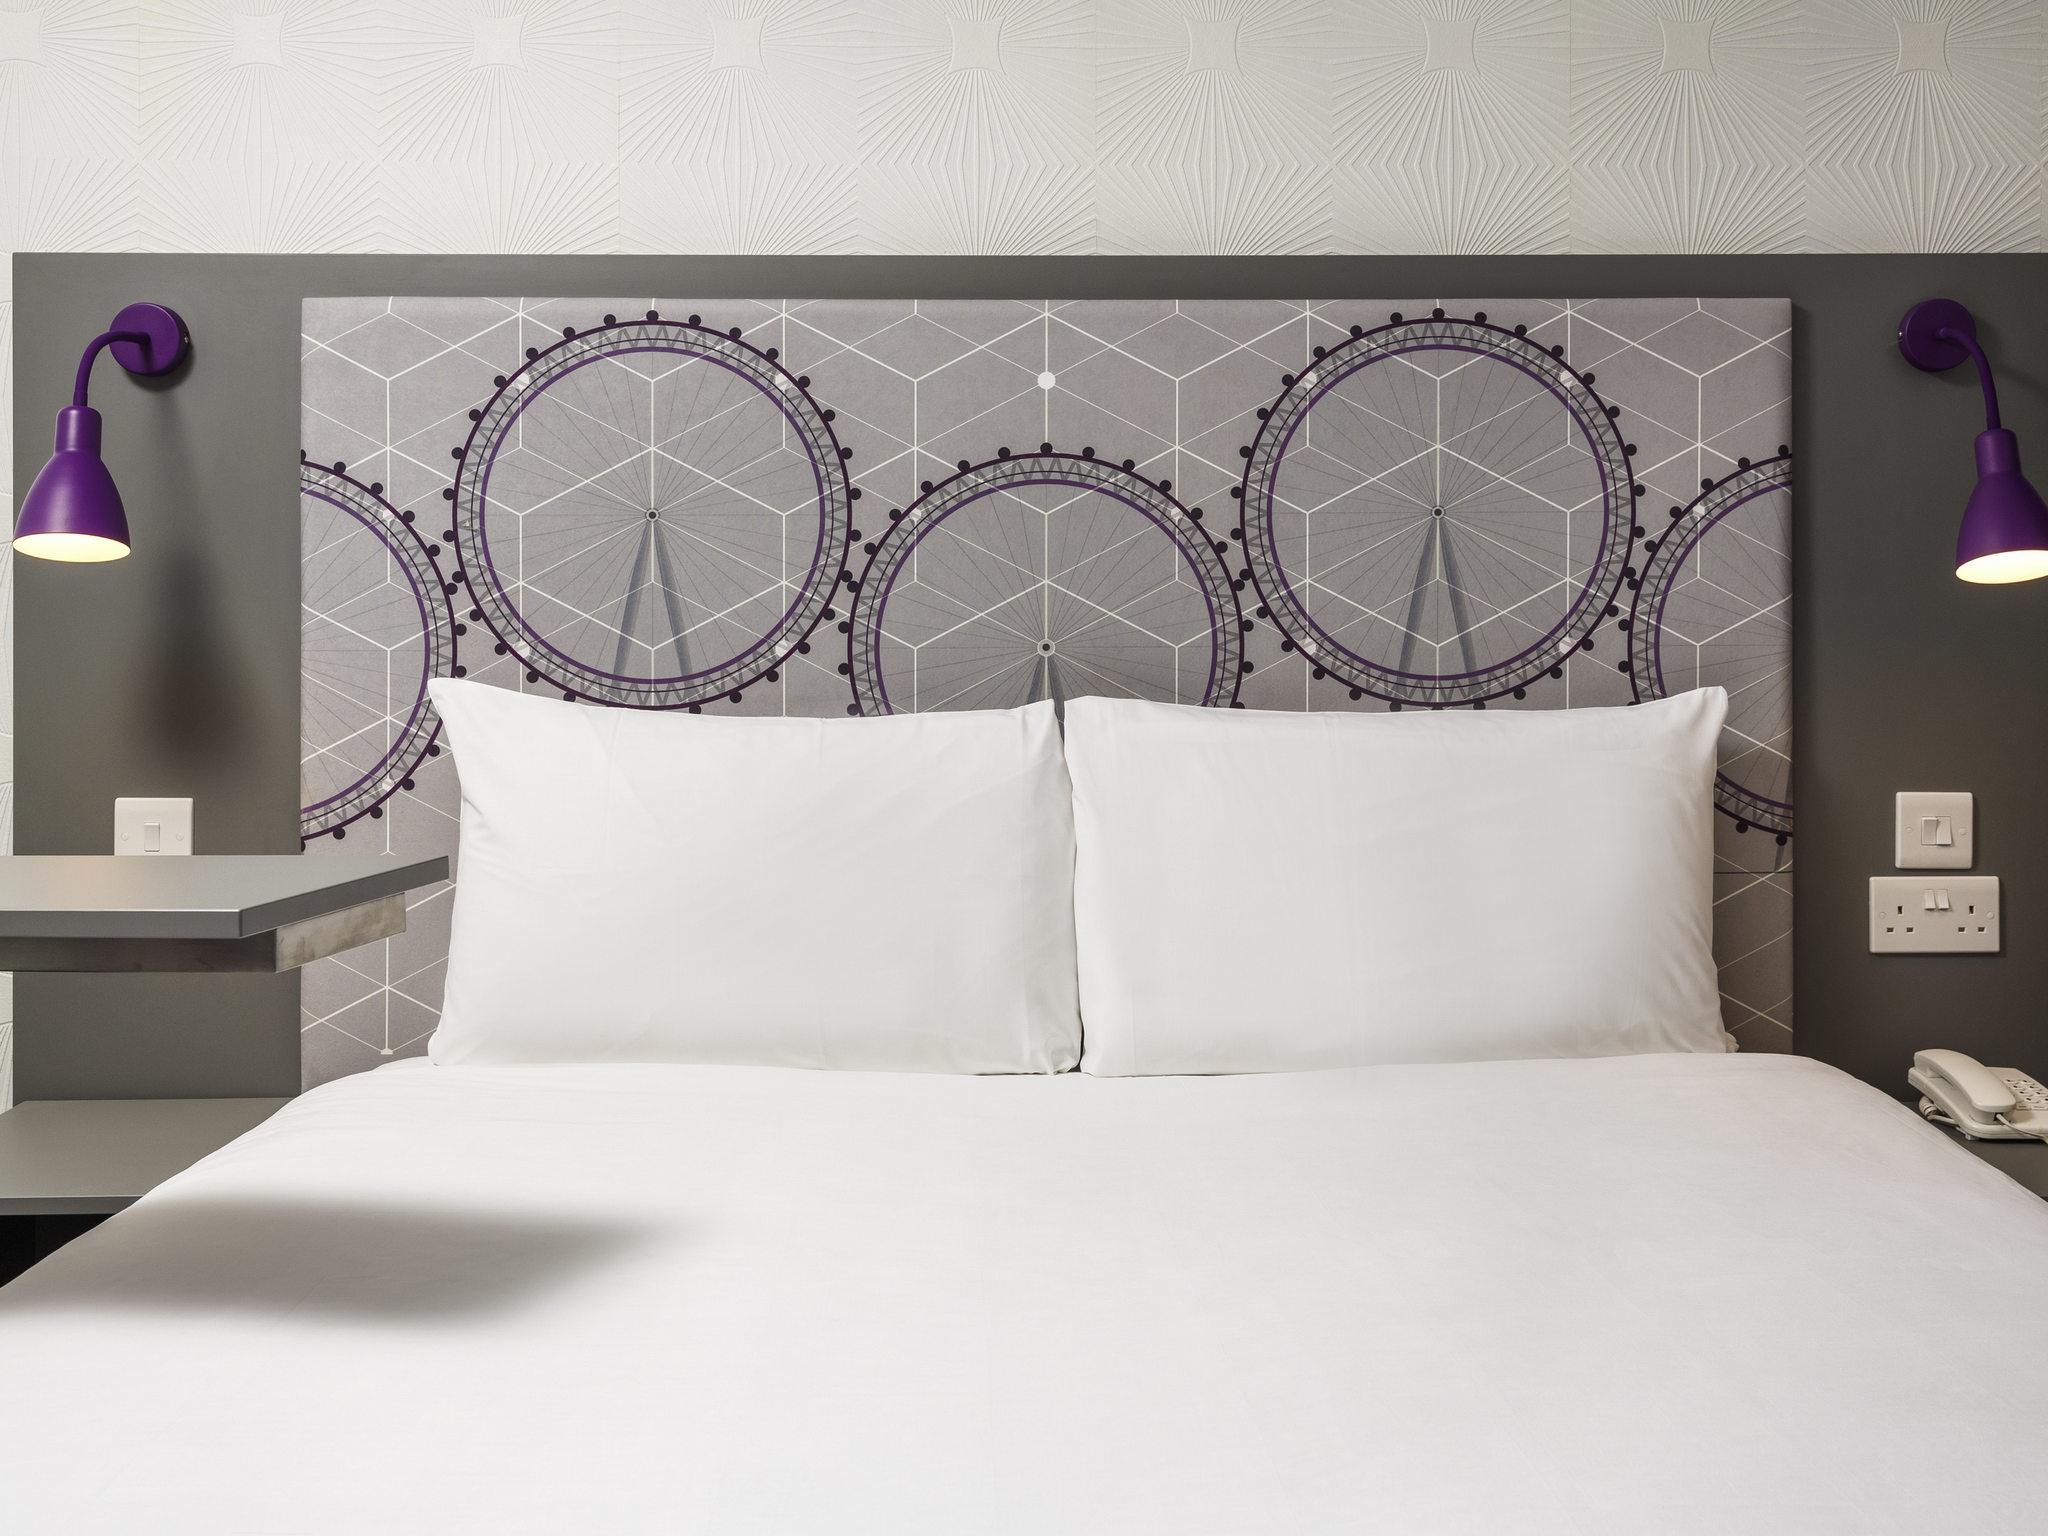 Ibis Styles London Croydon | Energetic Hotel in London